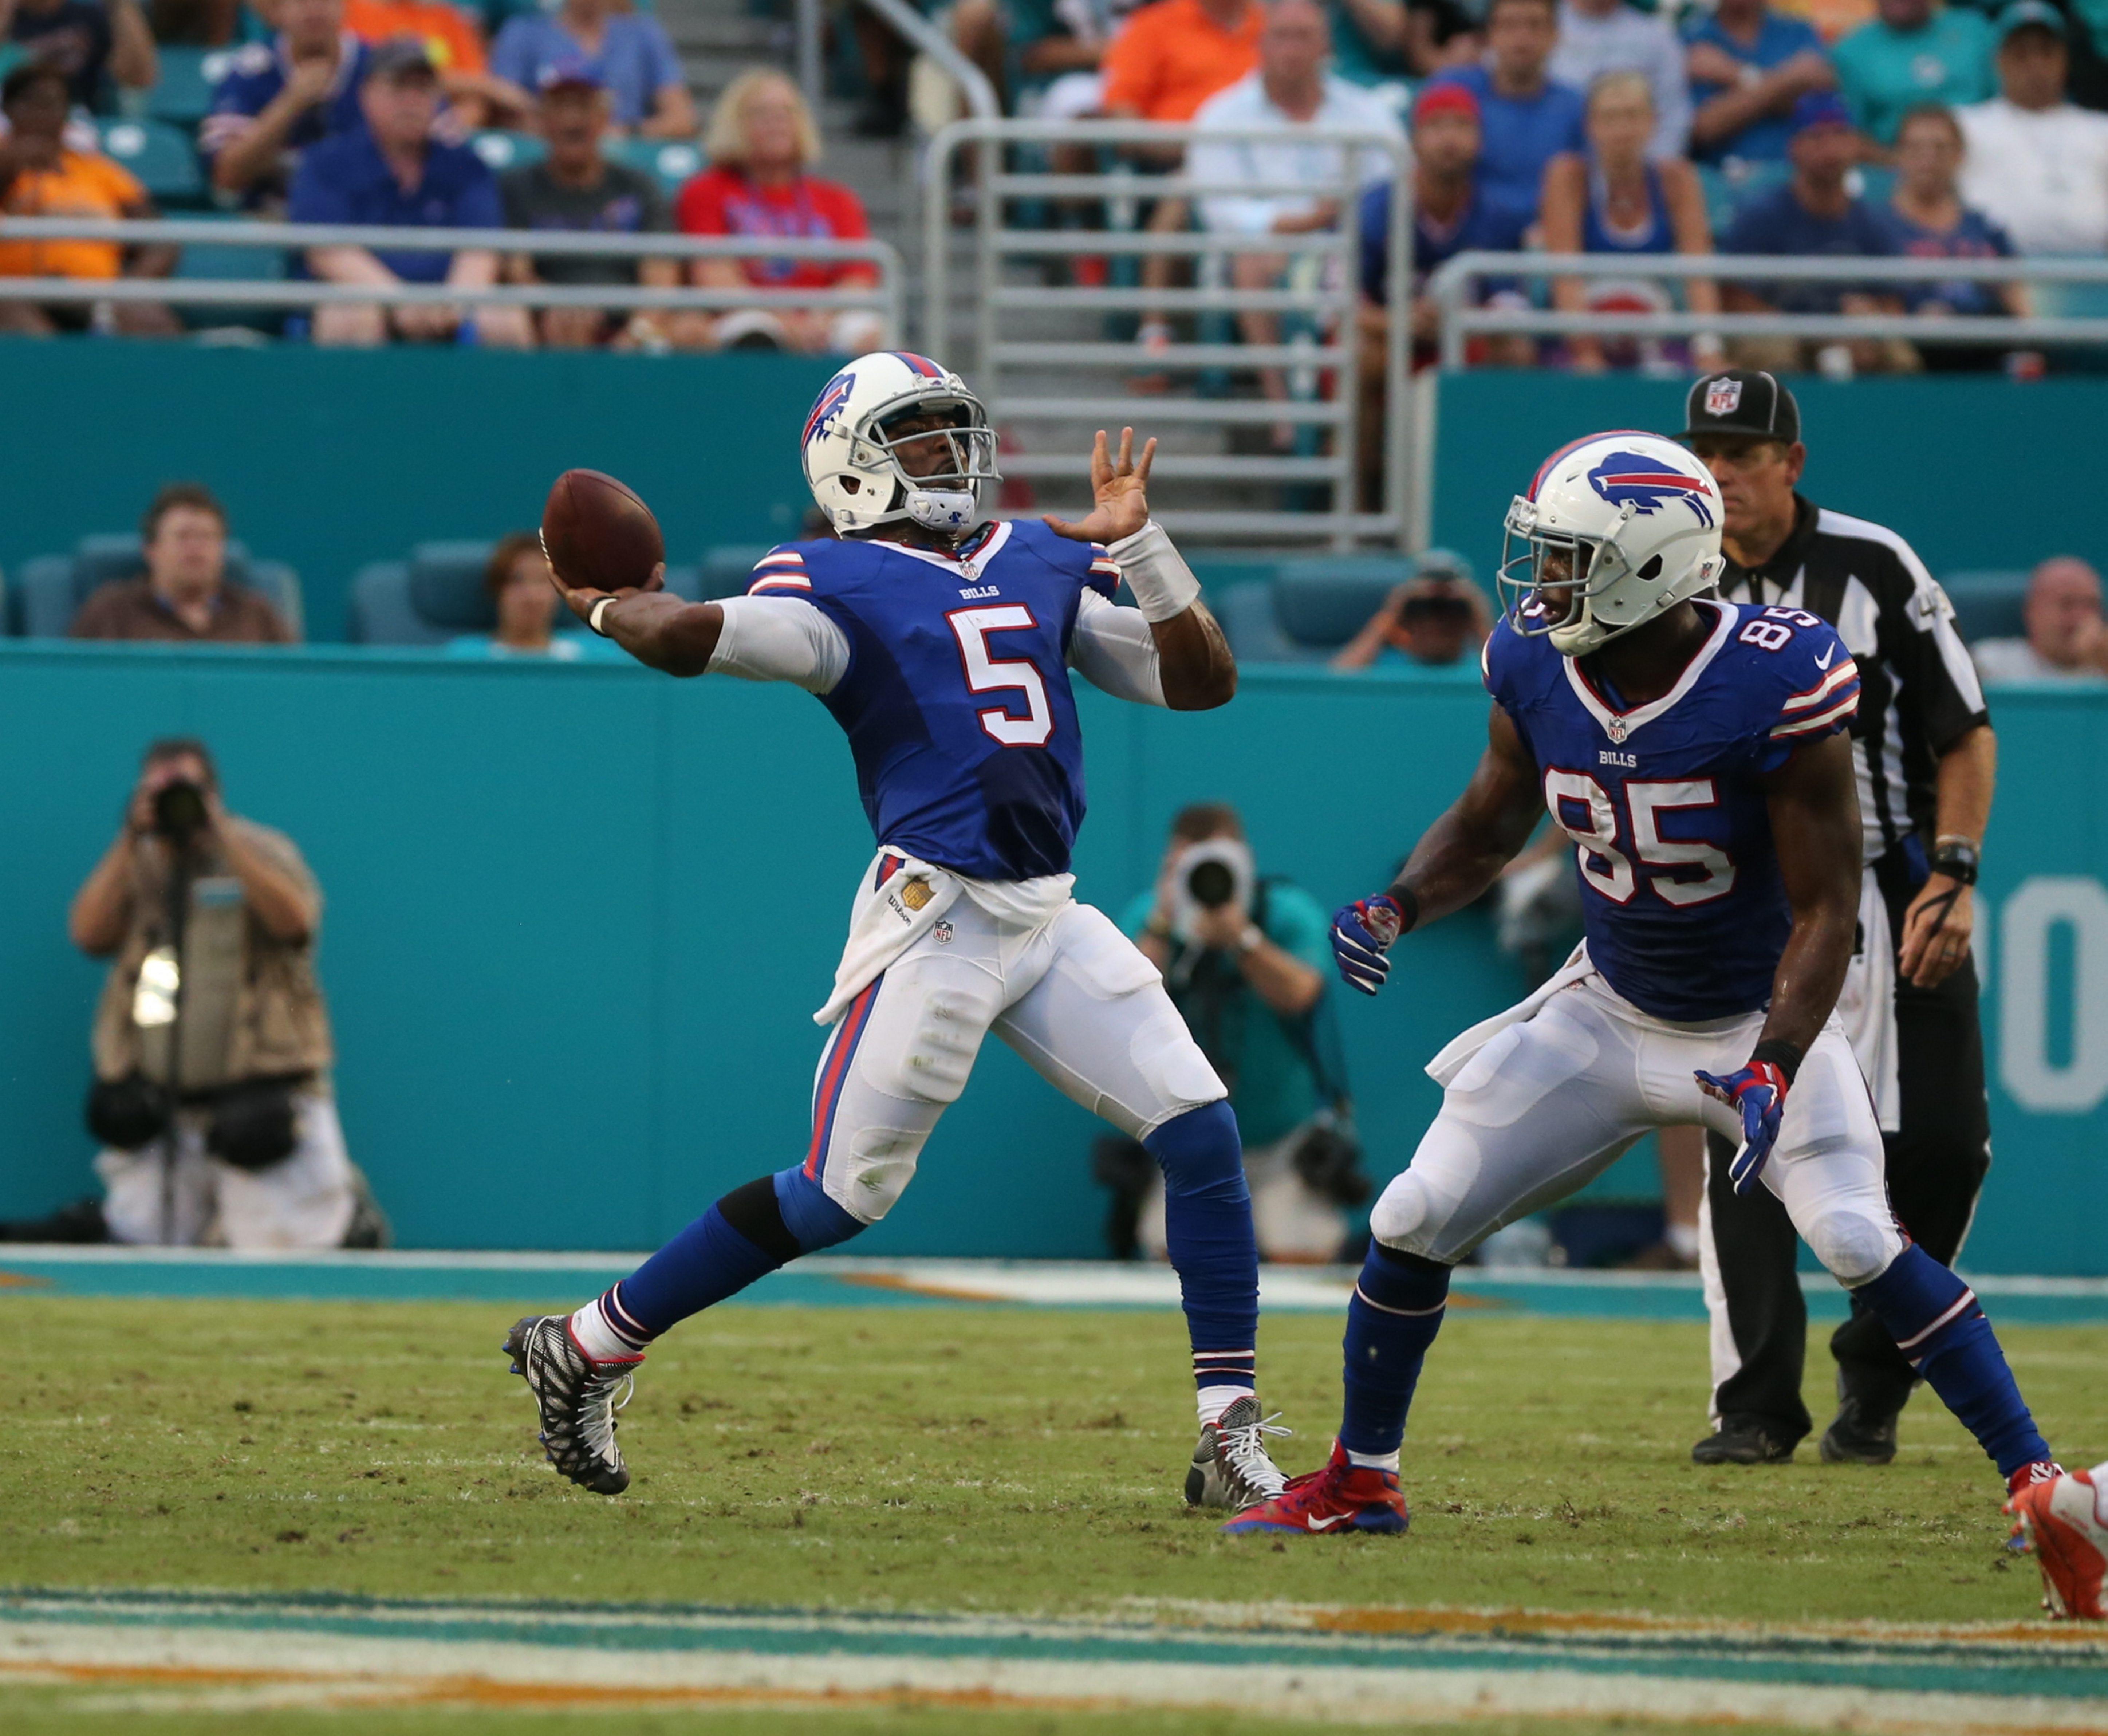 Buffalo Bills quarterback Tyrod Taylor (5) throws the ball during the second quarter. (James P. McCoy/ Buffalo News)